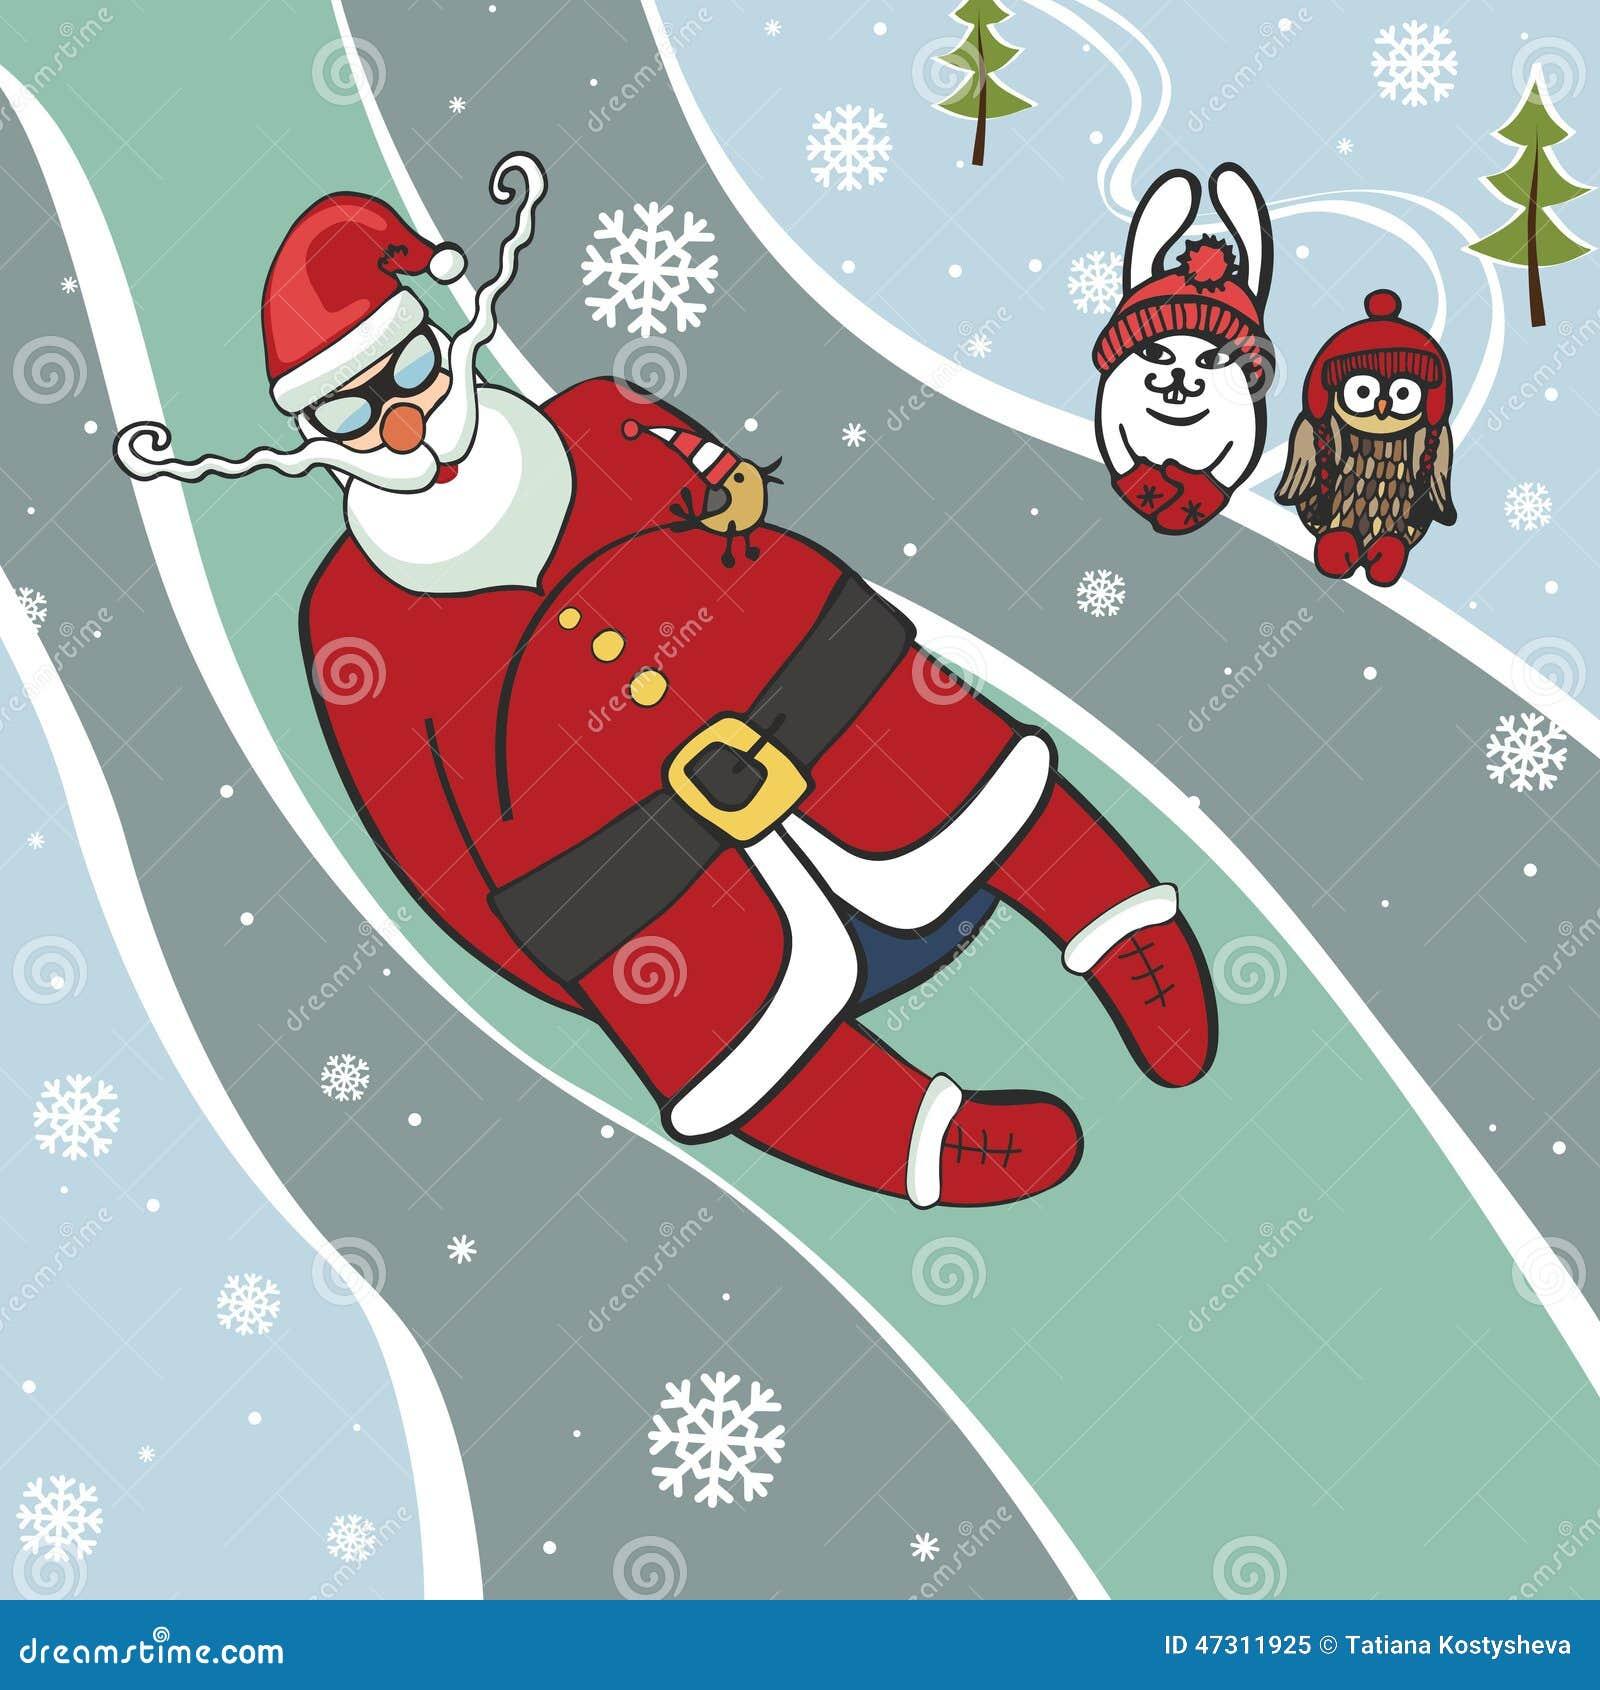 Santa Luge Coureur Illustrations Humoristiques L Hiver Illustration De Vecteur Illustration Du Humoristiques Hiver 47311925